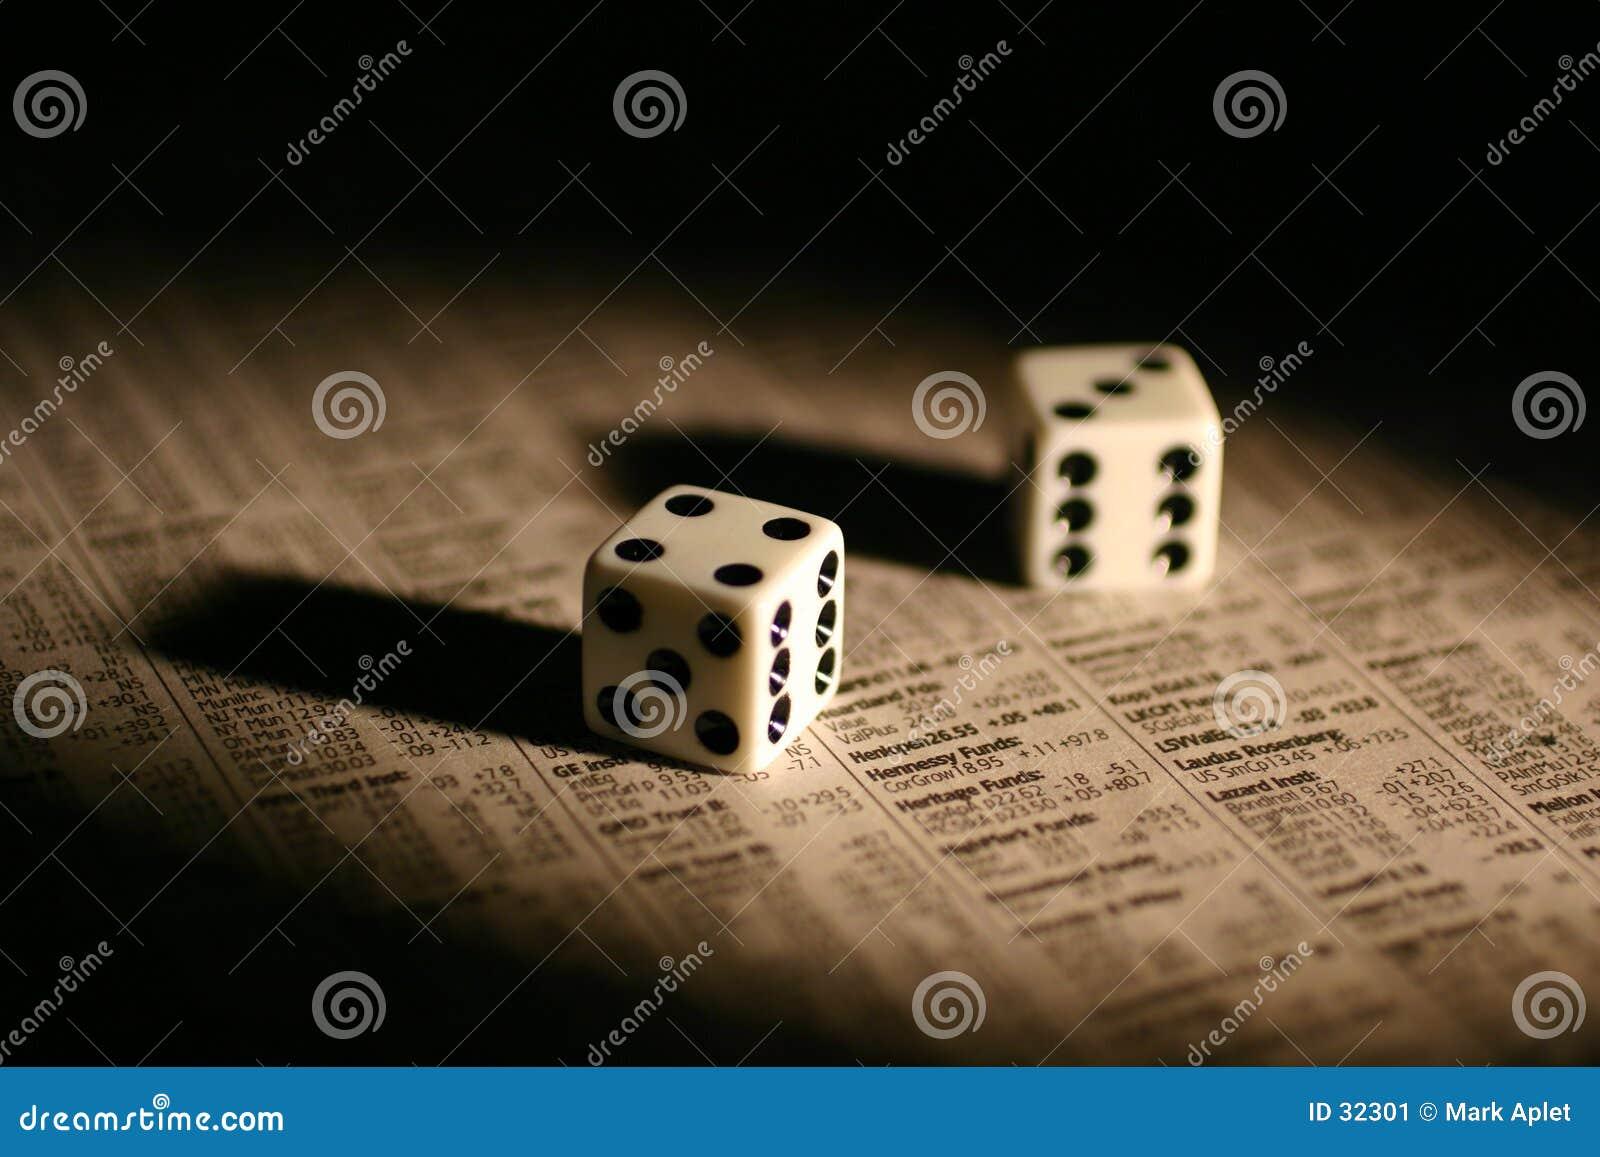 Gambling with stocks